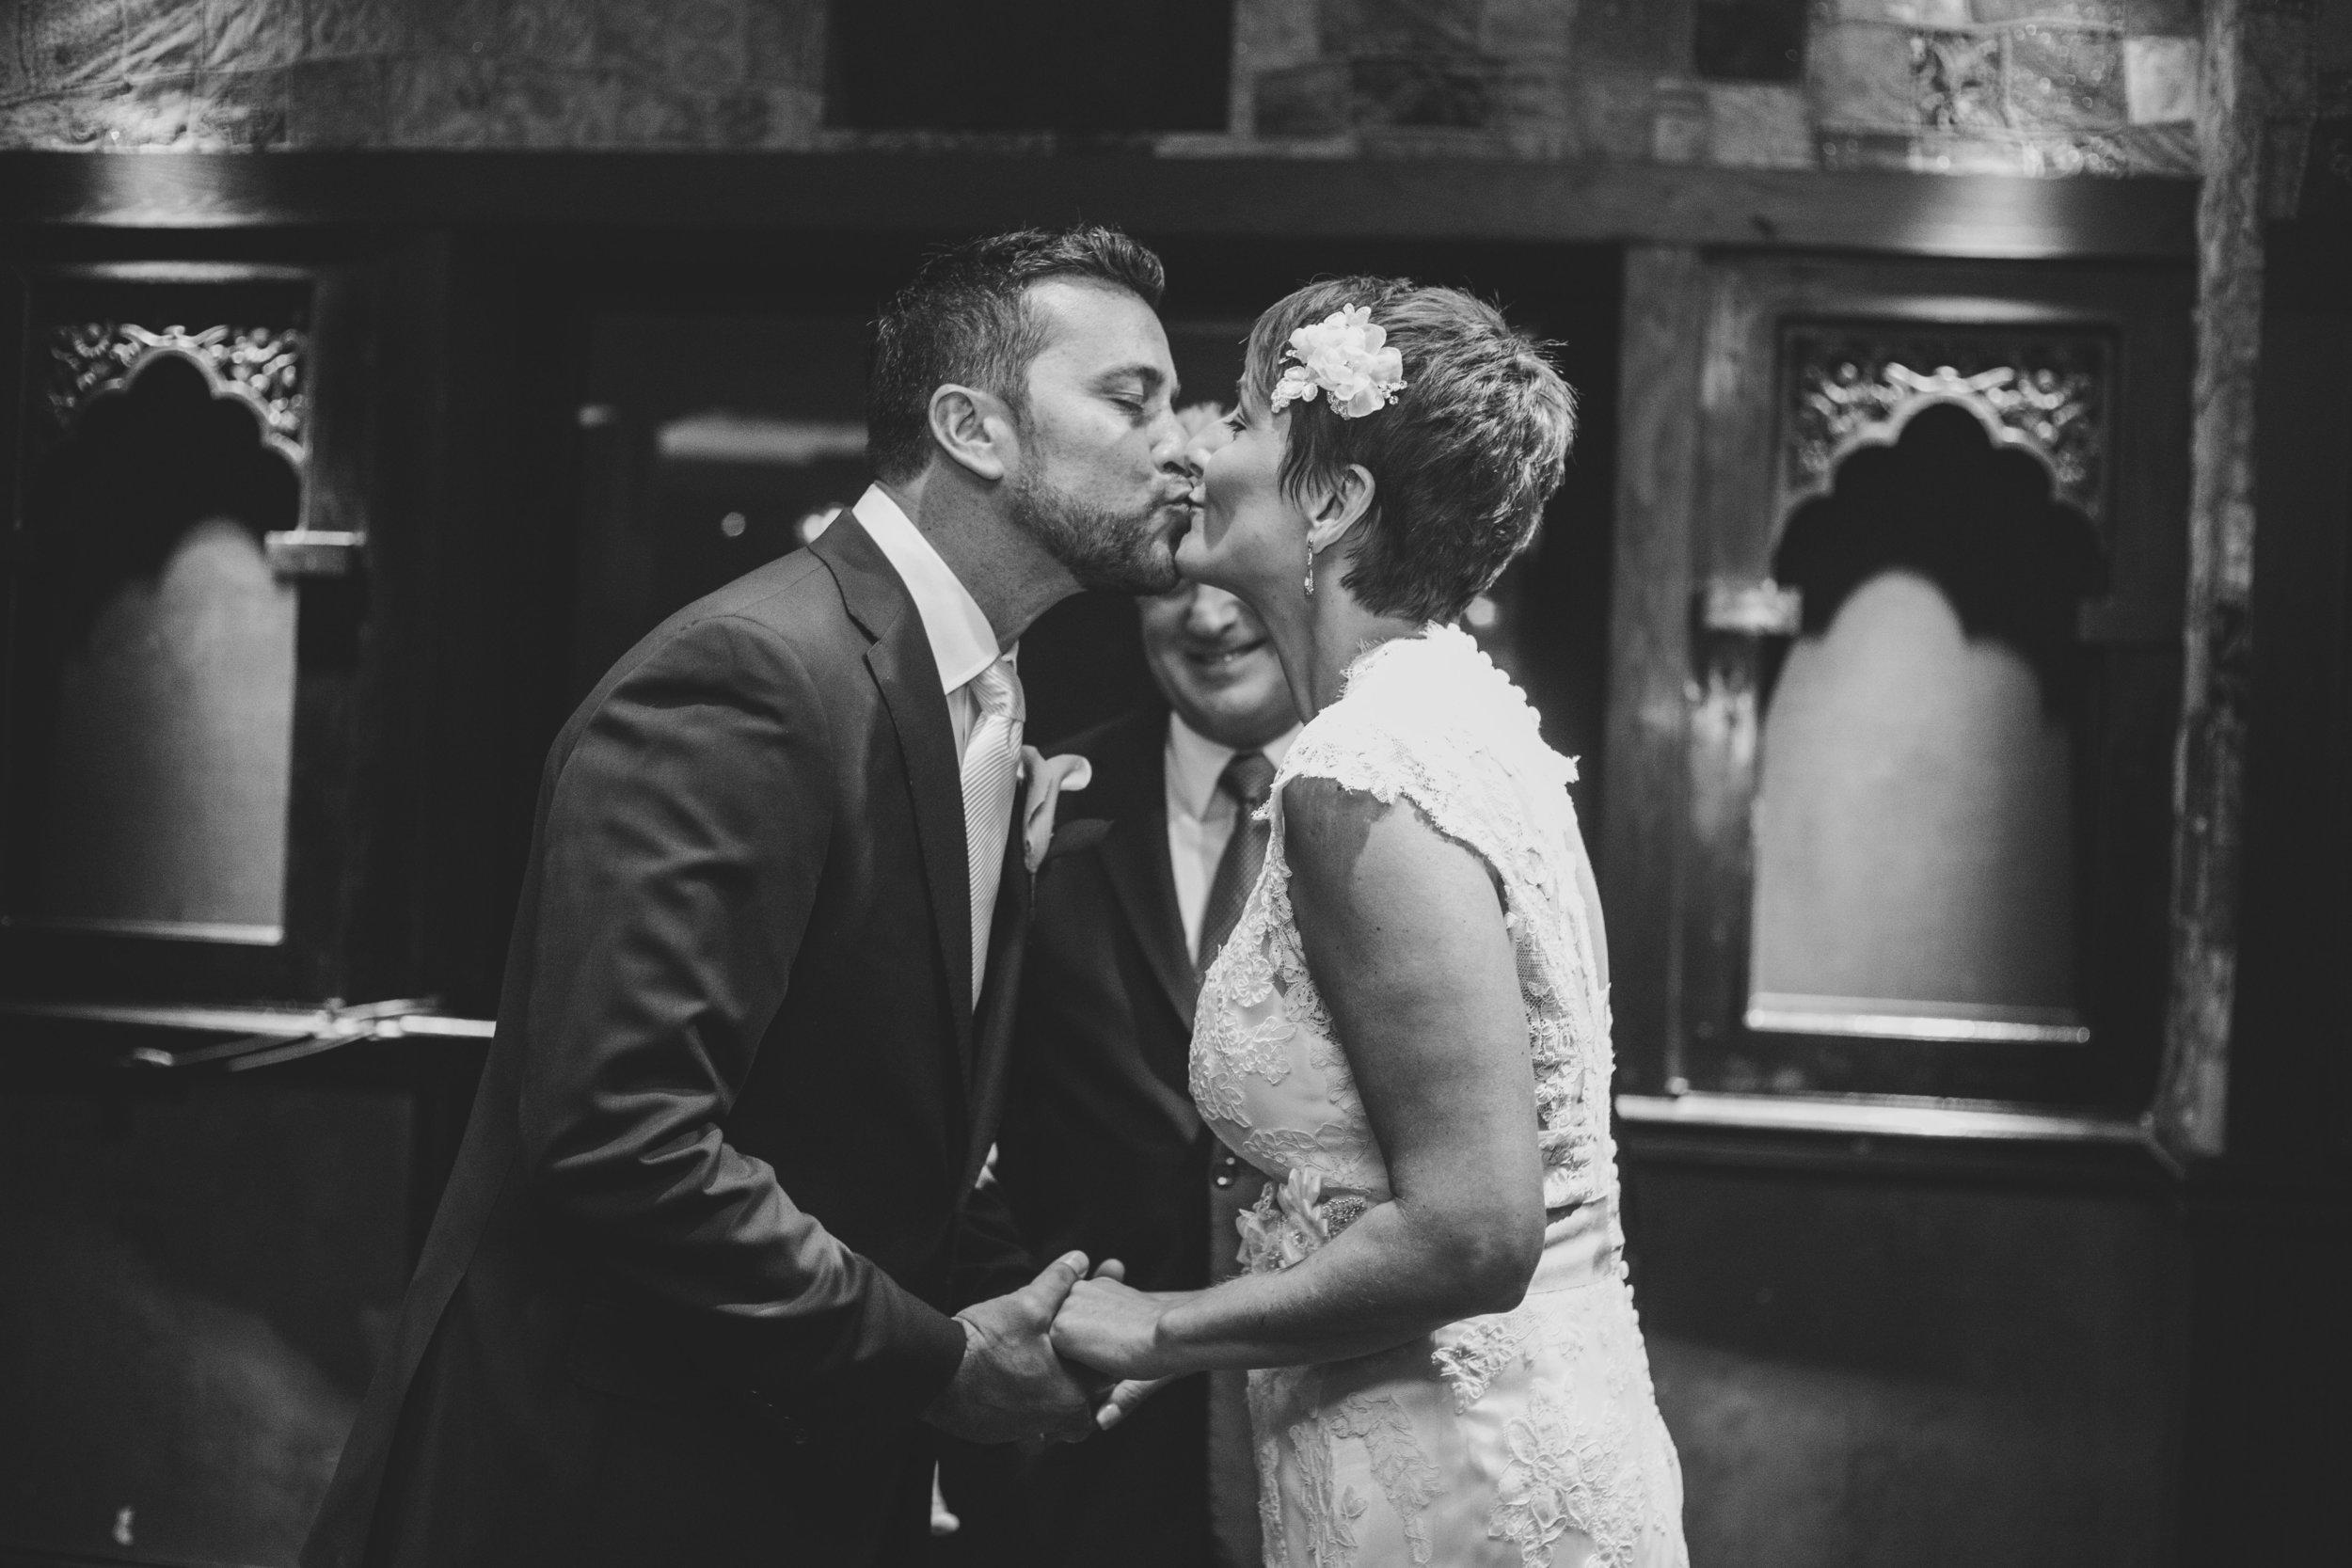 ATGI_Kat and Gabe Wedding 2016_2S8A5327.jpg